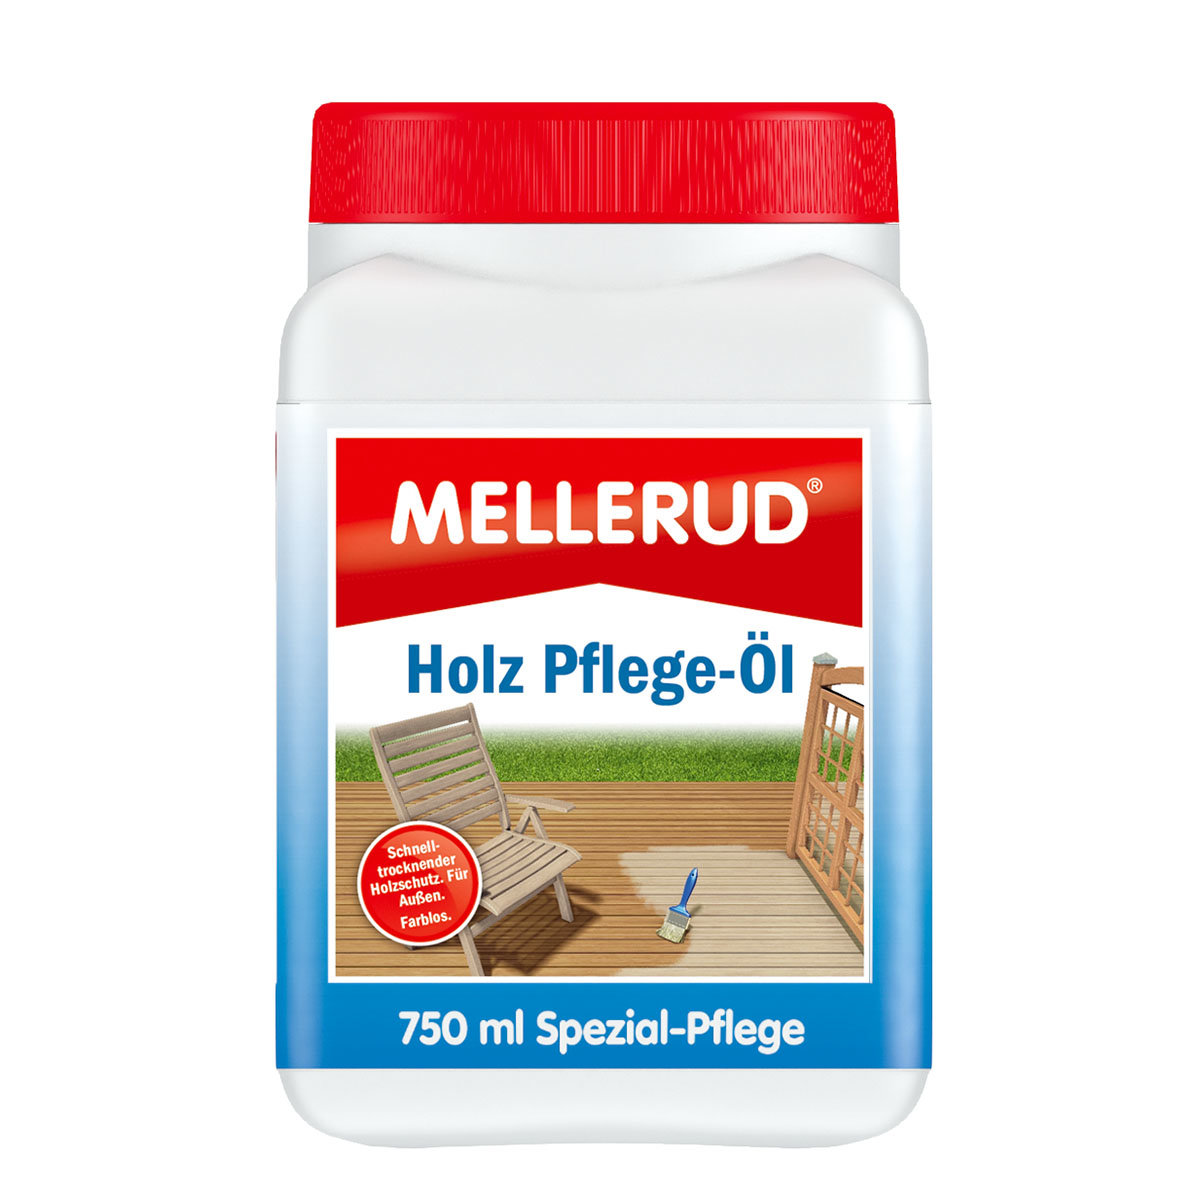 MELLERUD® Holz Pflege-Öl farblos 750 ml